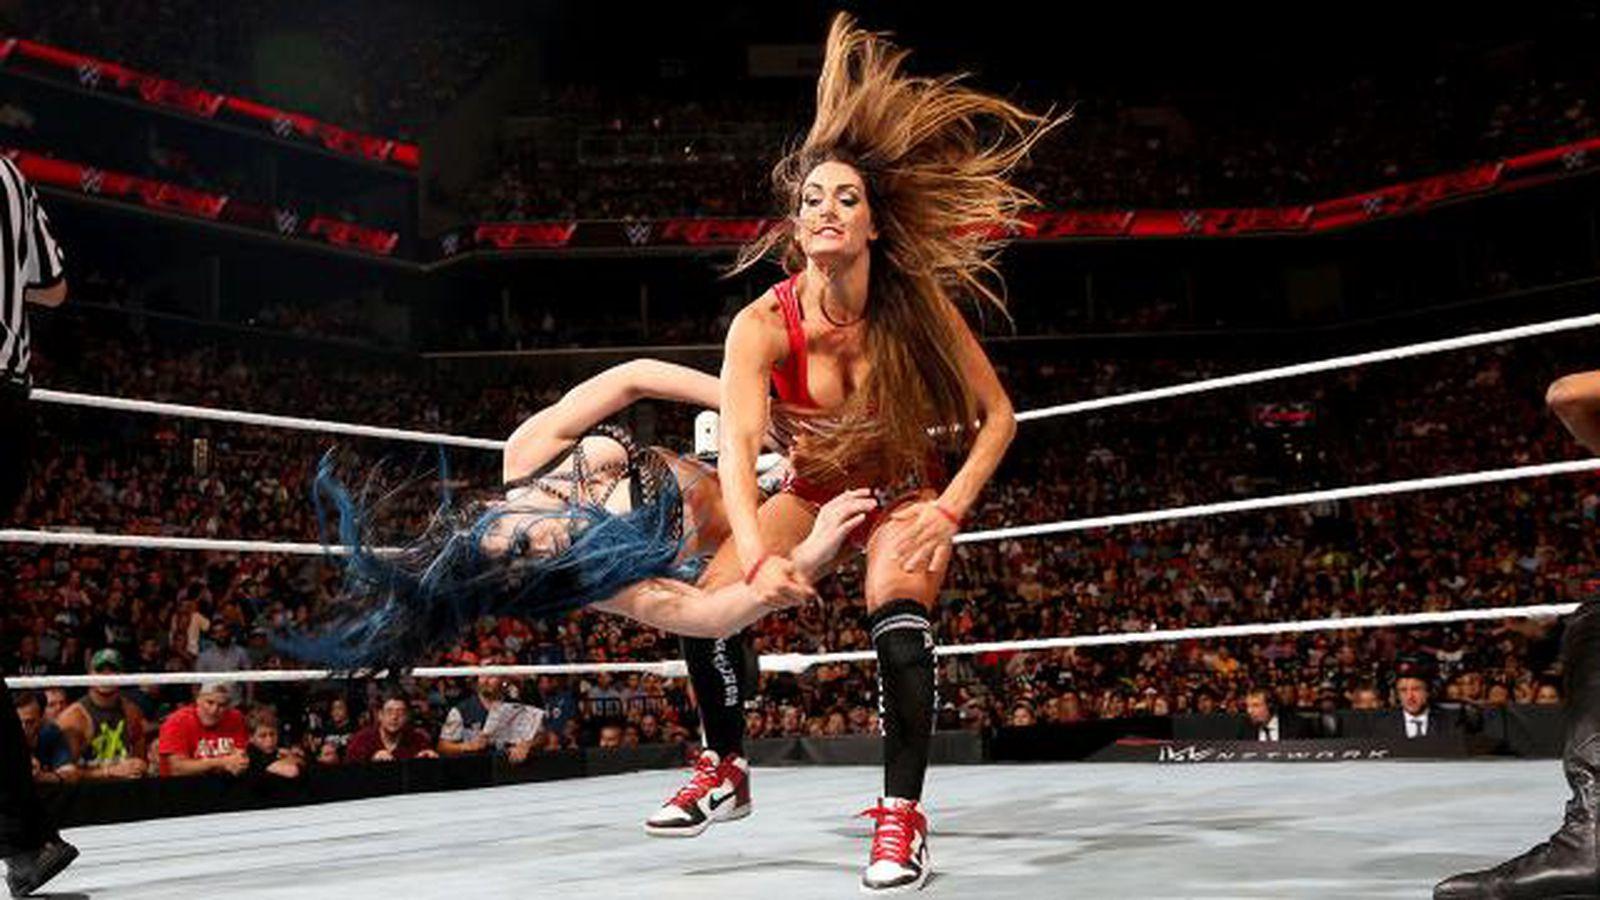 gif nikki bella destroys paige with a vicious forearm